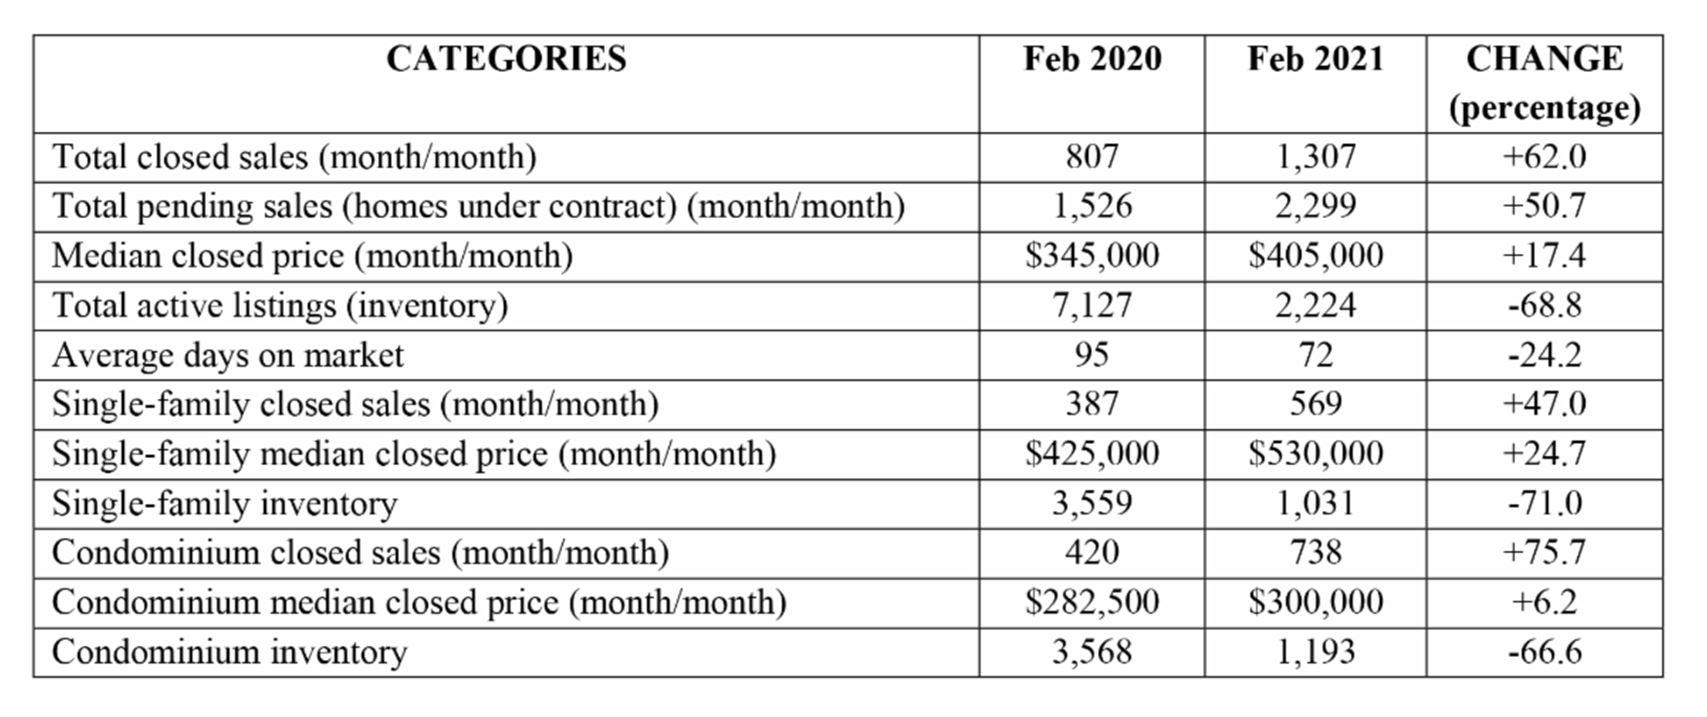 Naples Market Report - March 2021 infographic Breakdown February 2021 v February 2020 - Hoey Team exp Realty